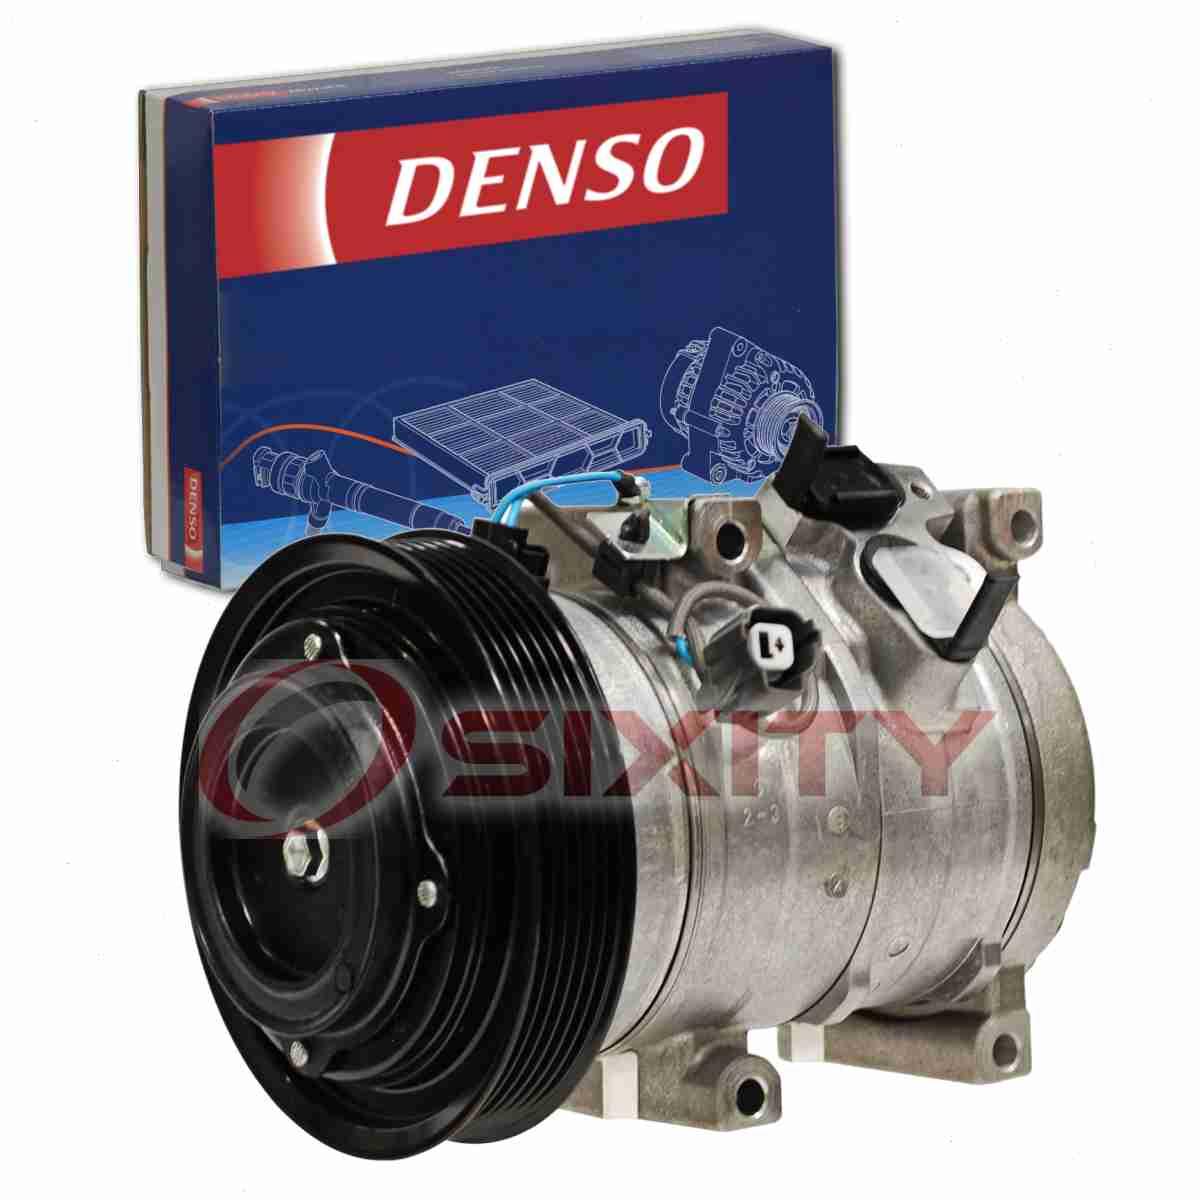 Denso Ac Compressor  U0026 Clutch For Honda Accord 3 0l V6 2003